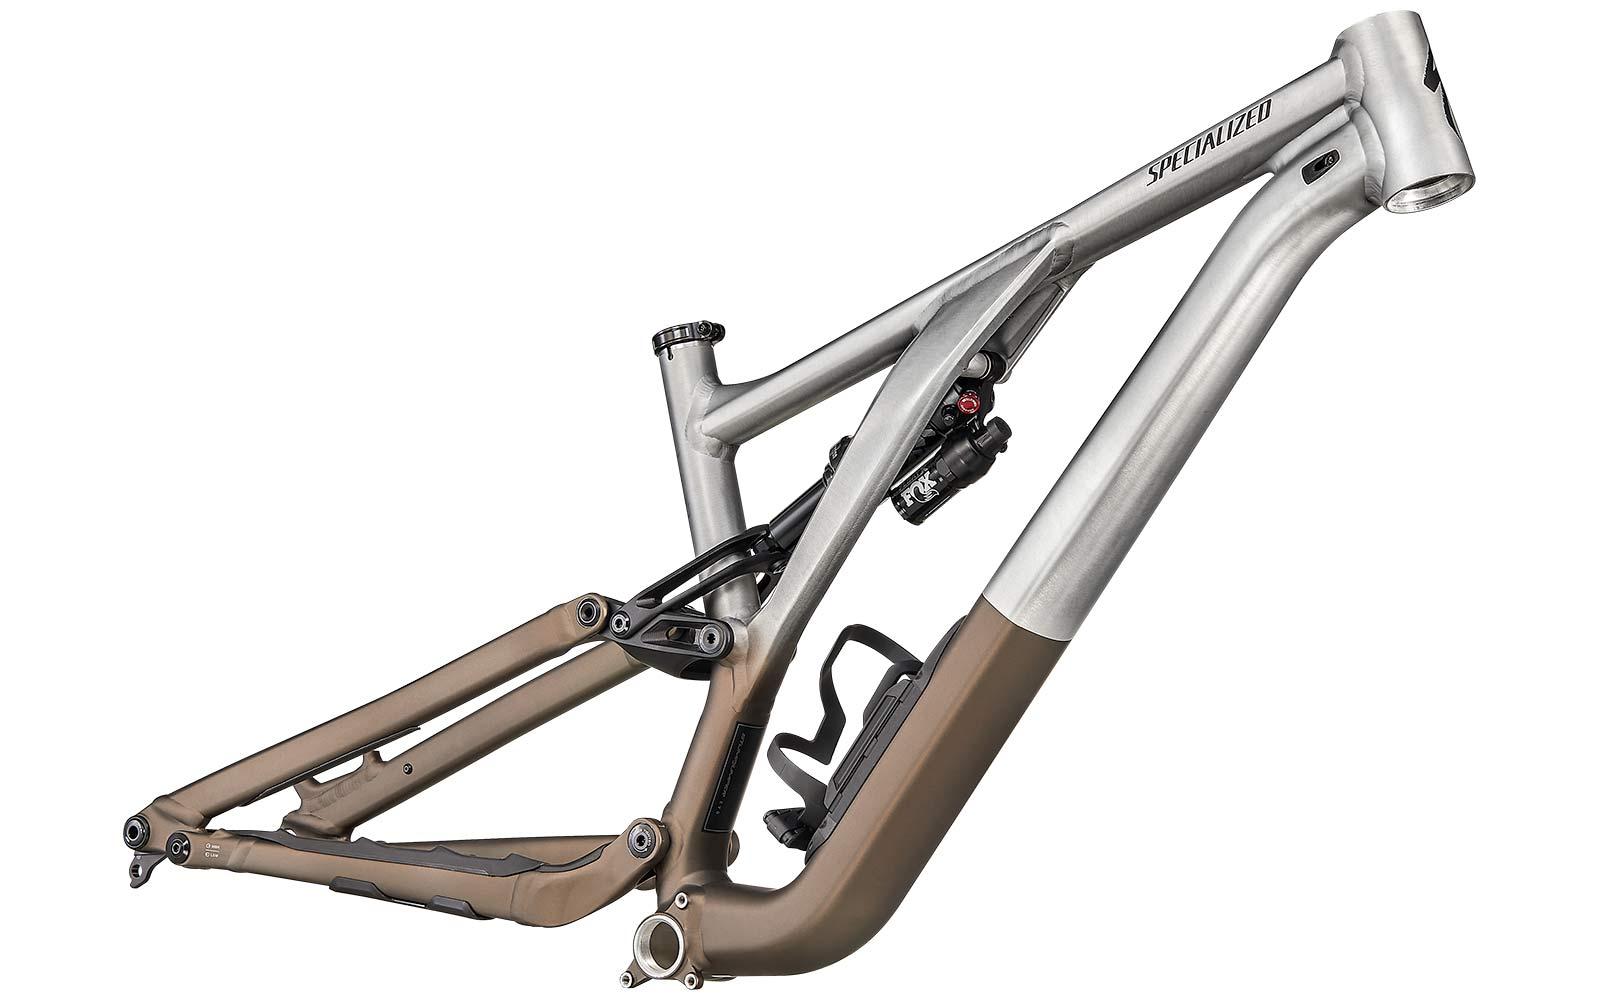 2022 Specialized Stumpjumper EVO Alloy trail bike, more affordable aluminum frameset